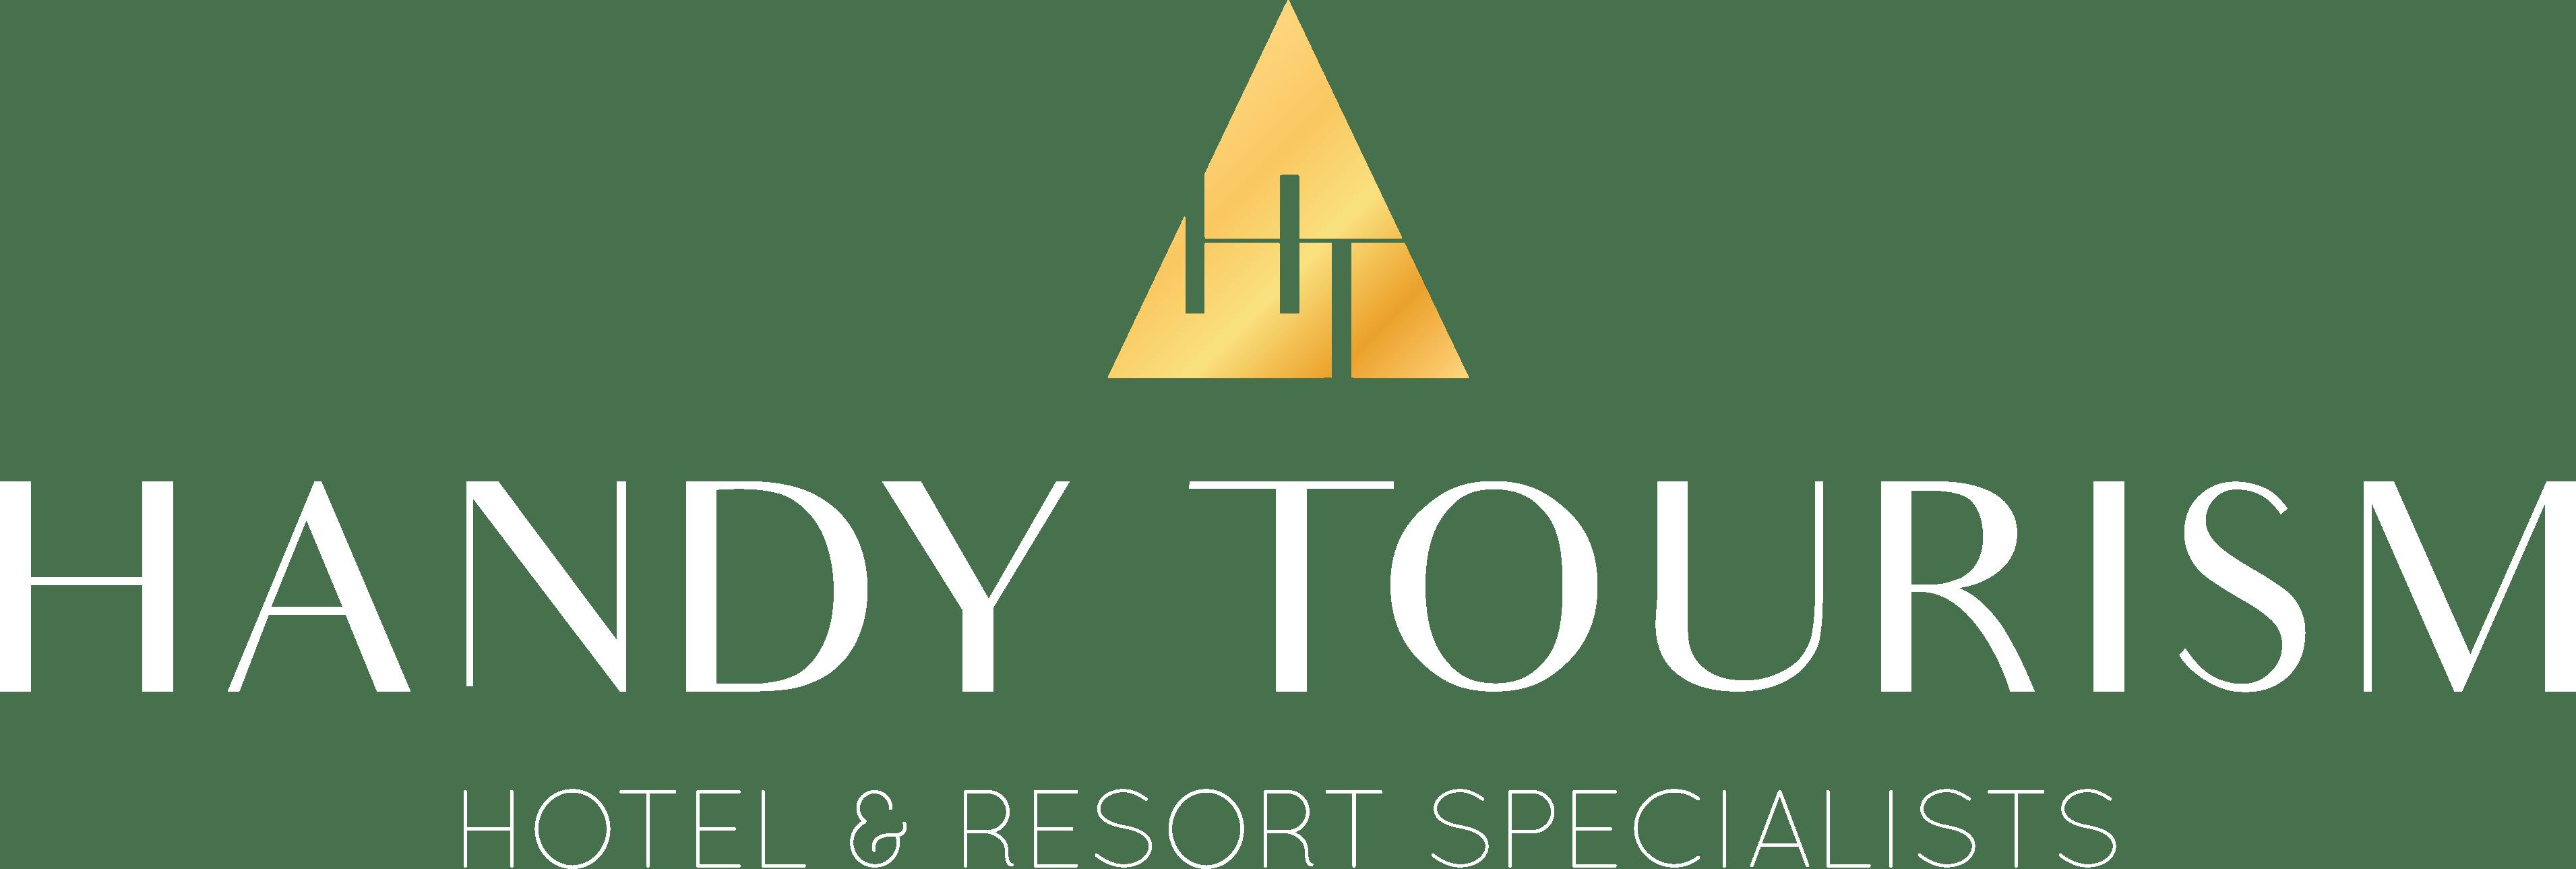 HandyTourism_Logo_Horizontal1_White